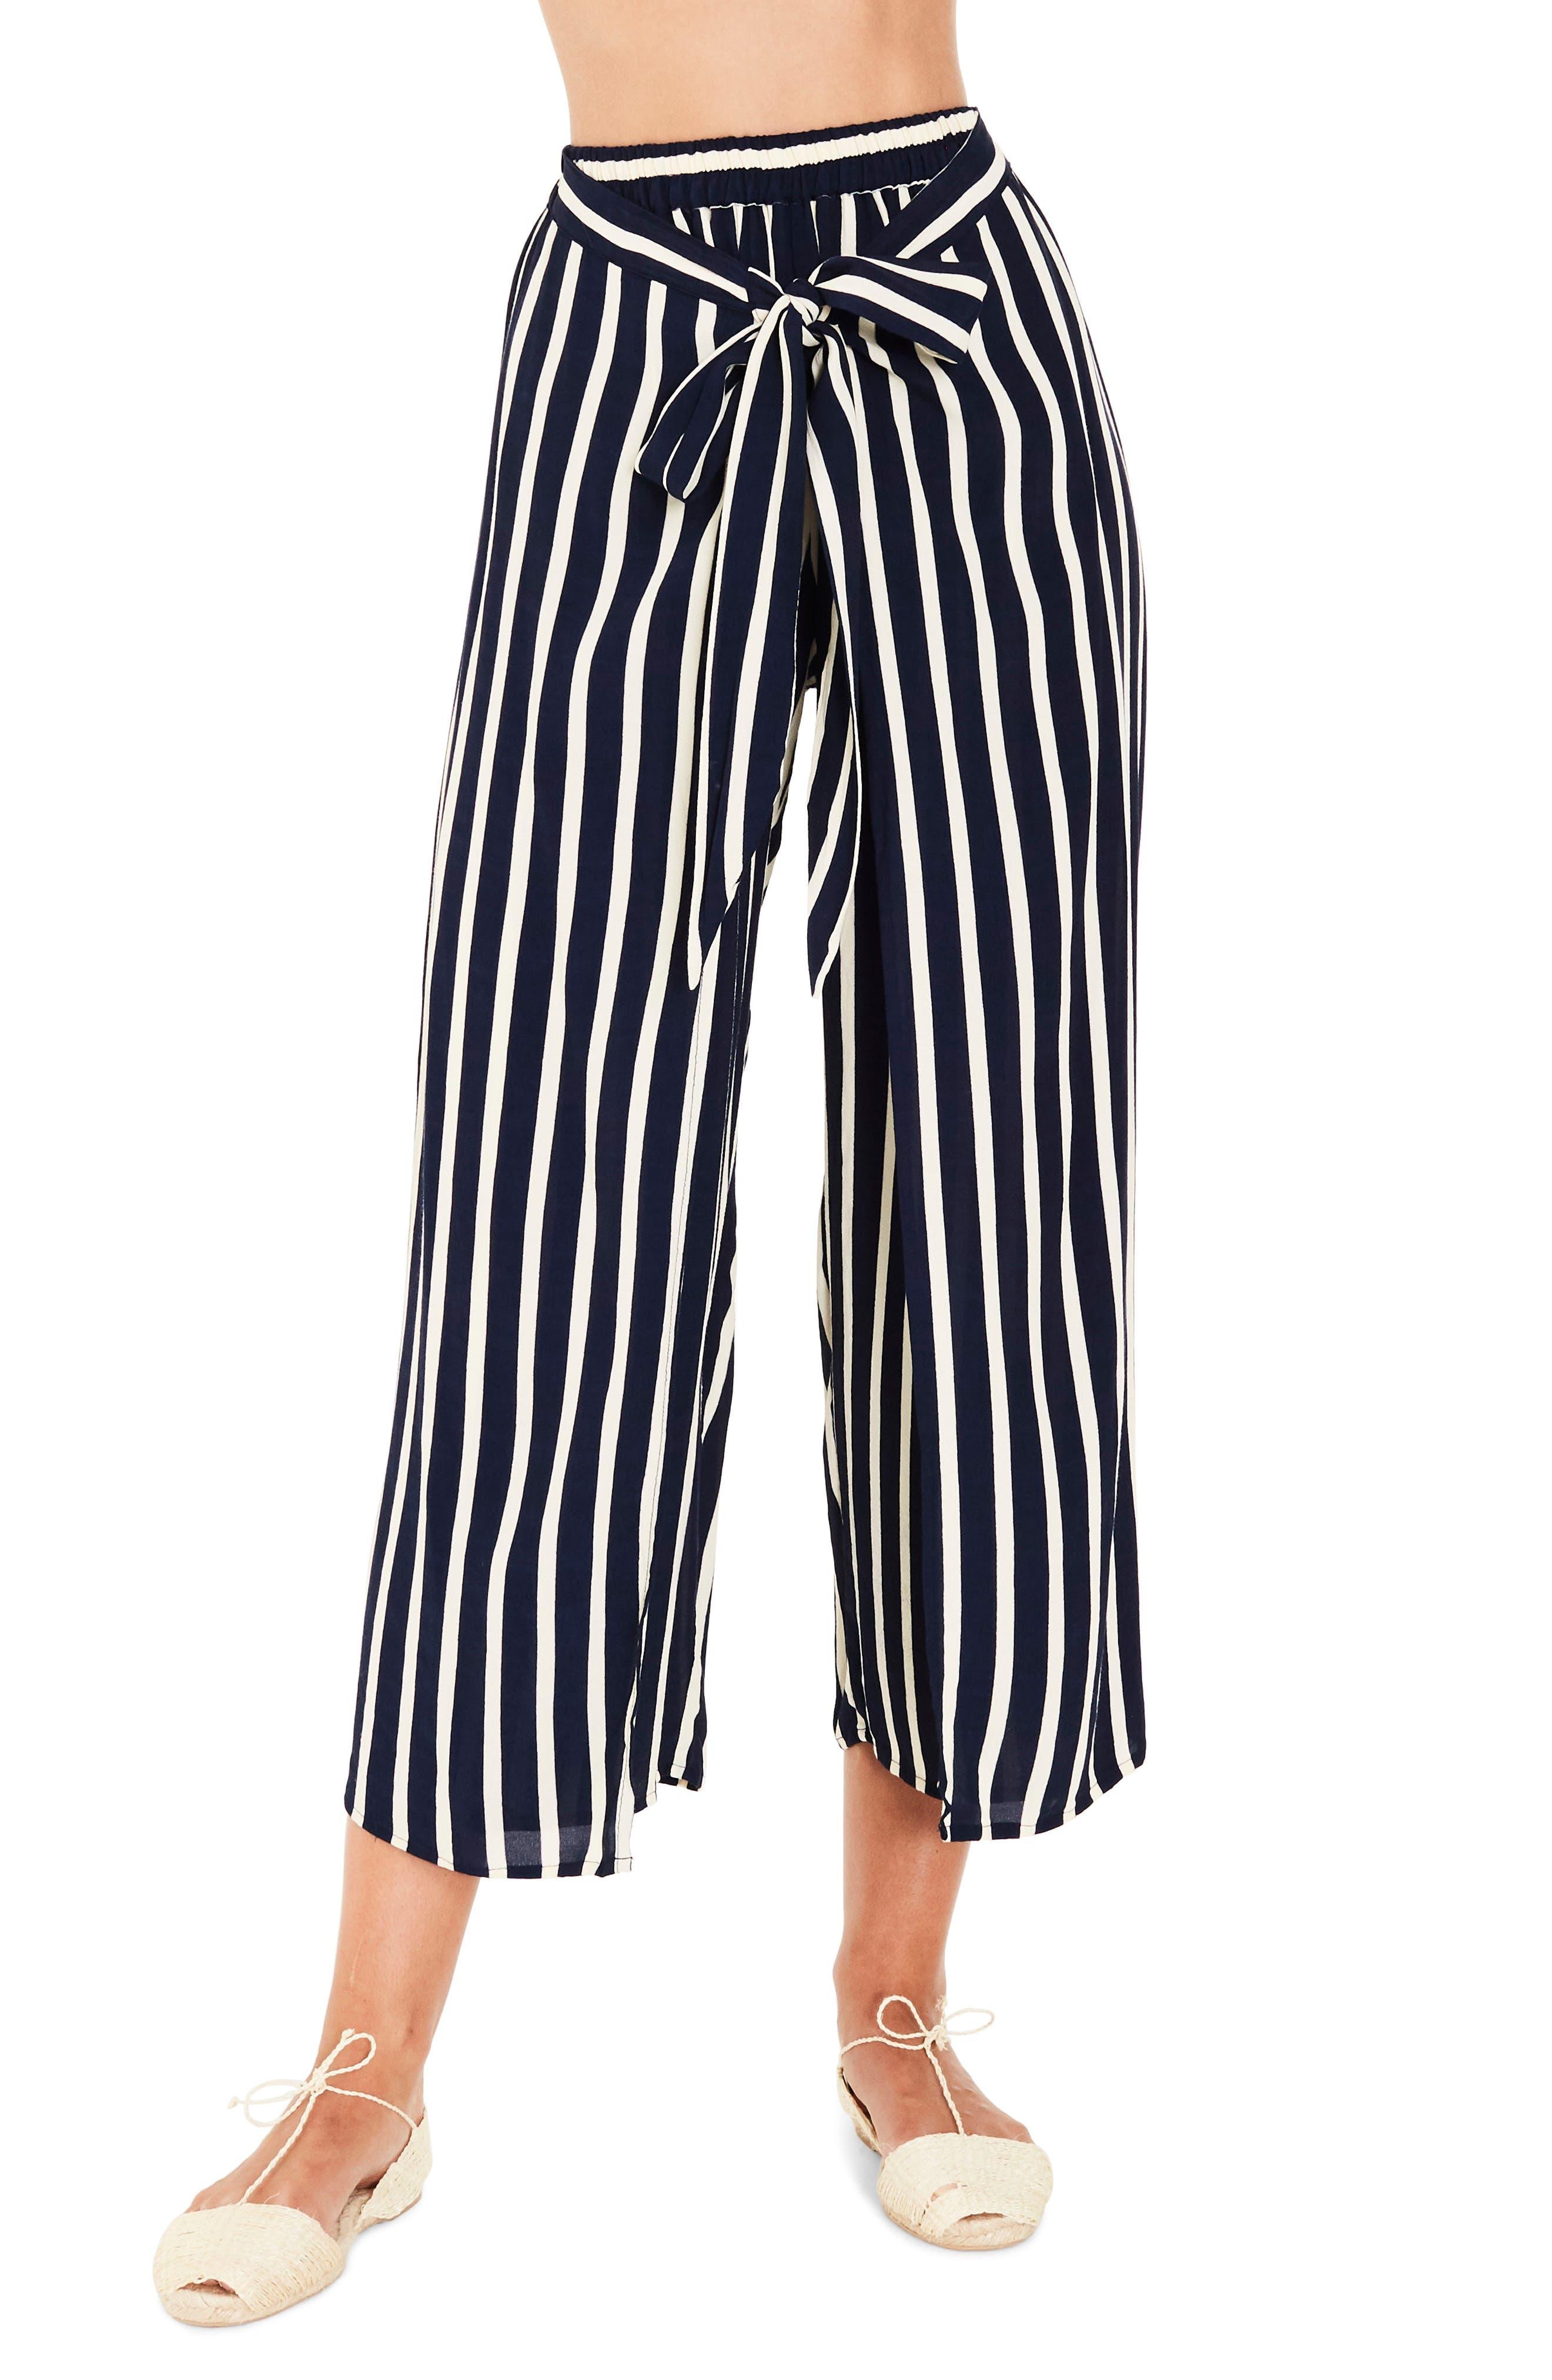 FAITHFULL THE BRAND Sand Island Stripe Tulip Pants